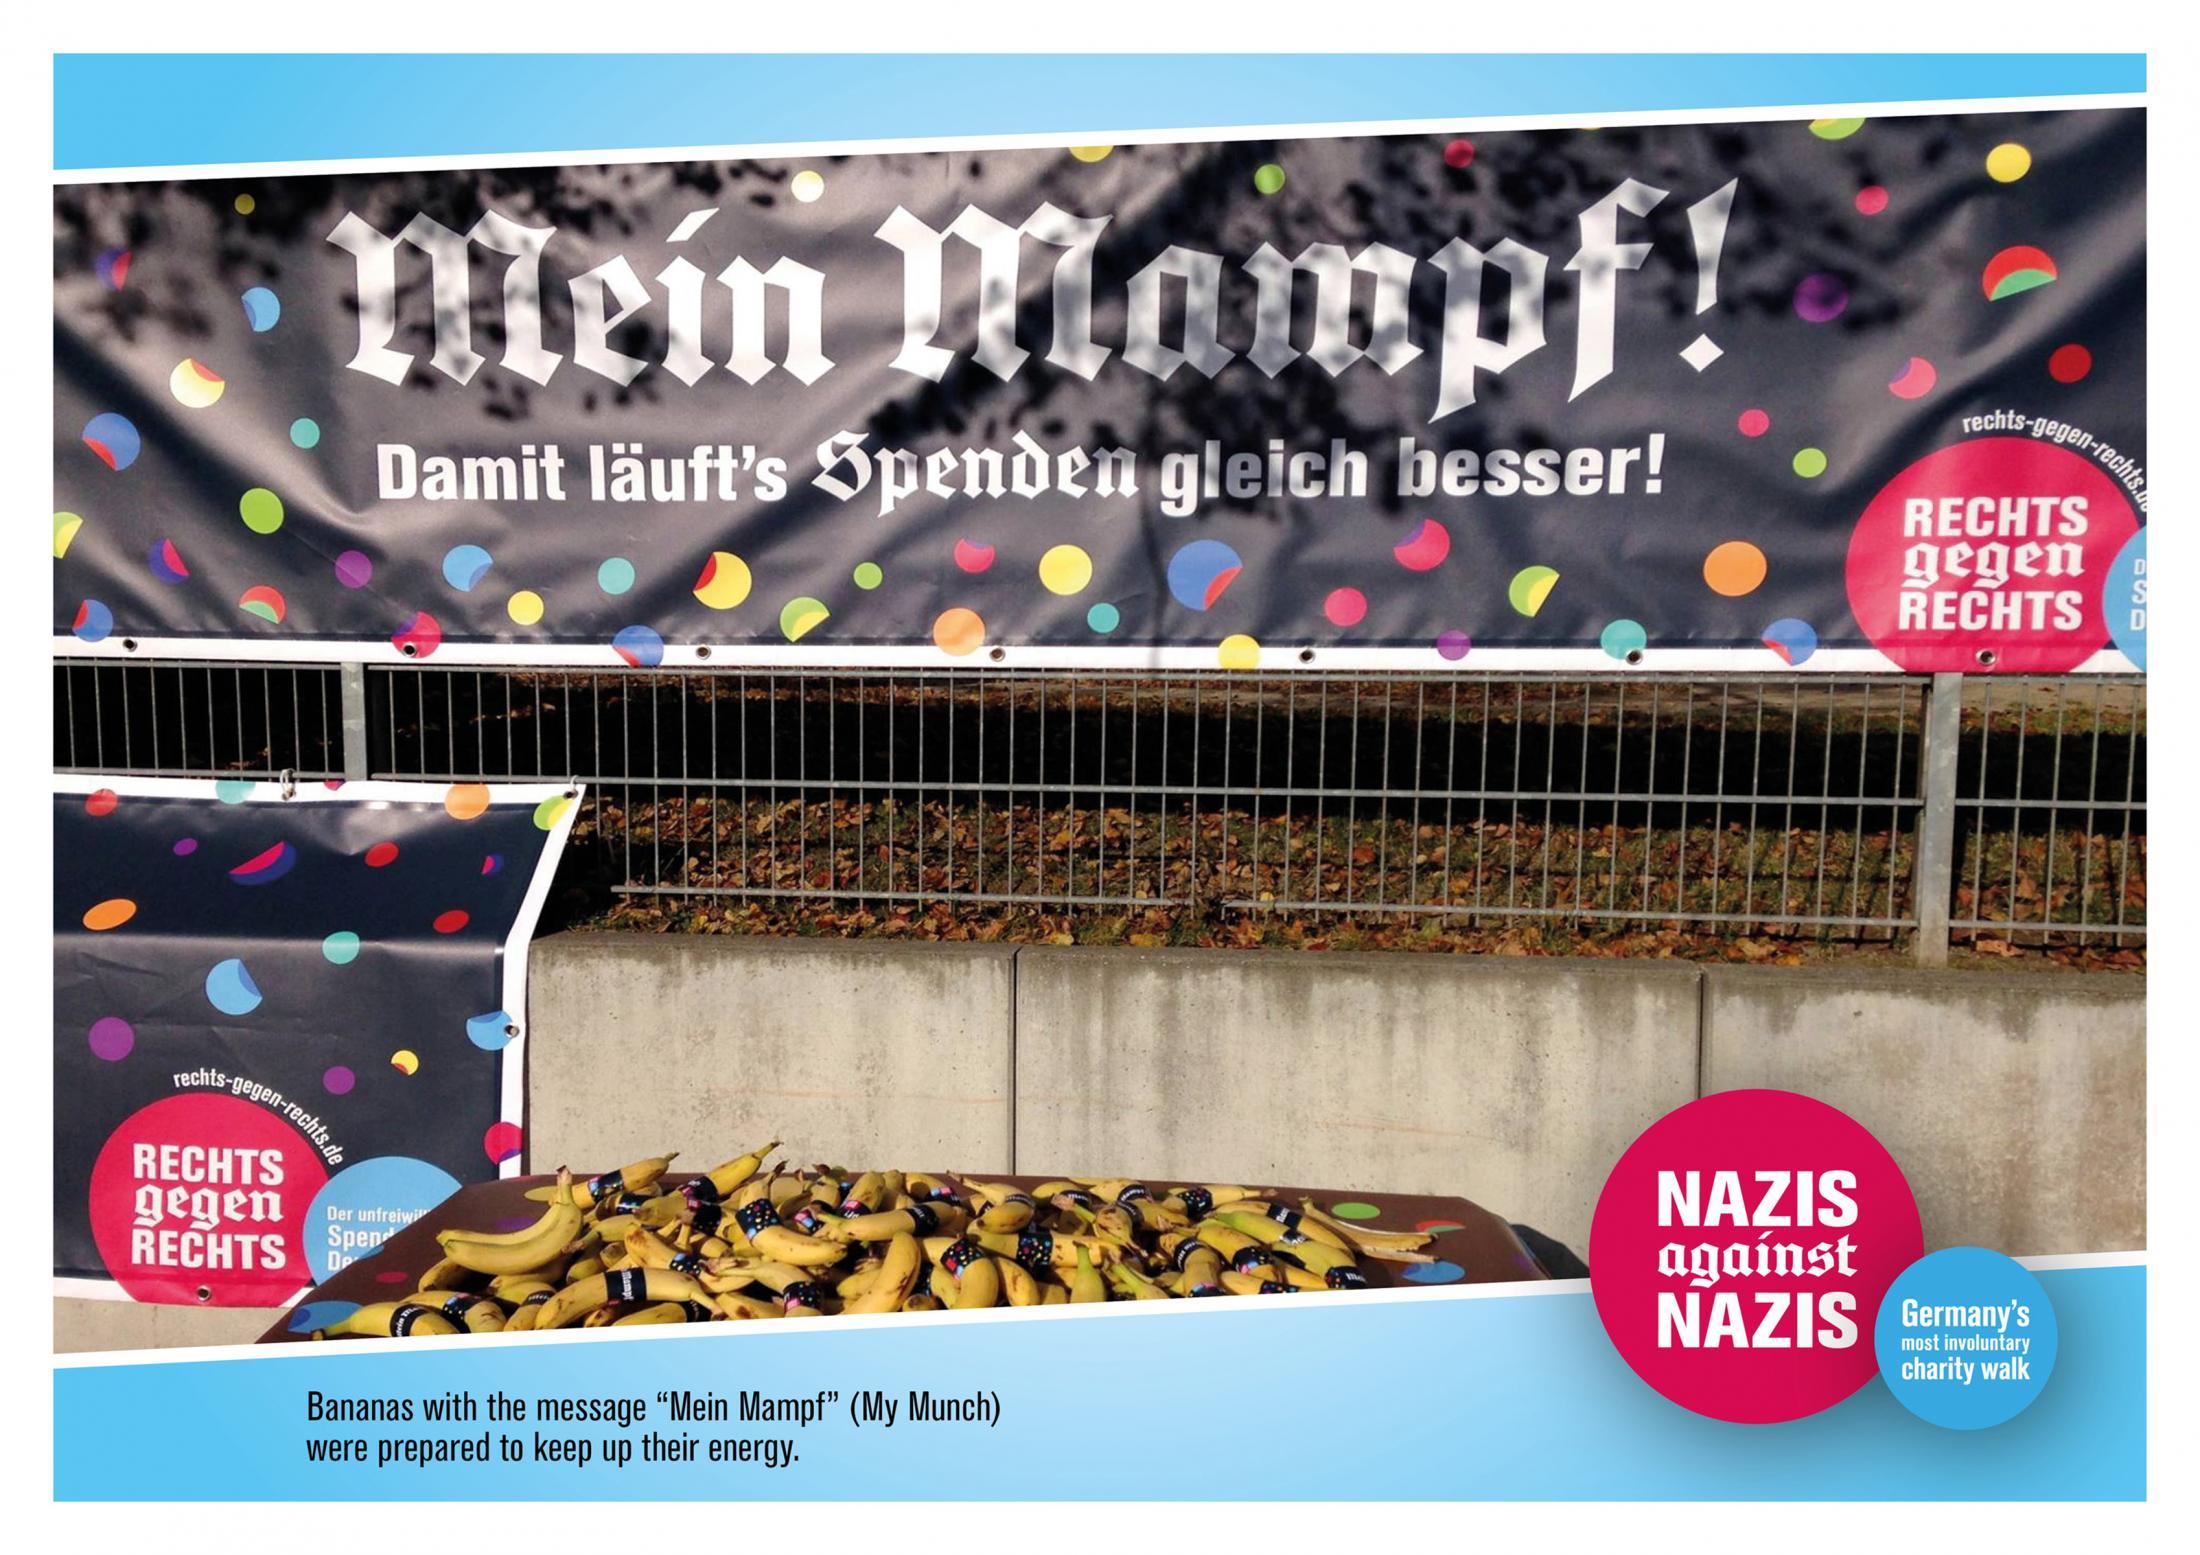 Thumbnail for Nazis against Nazis- Germany's Most Involuntary Charity Walk